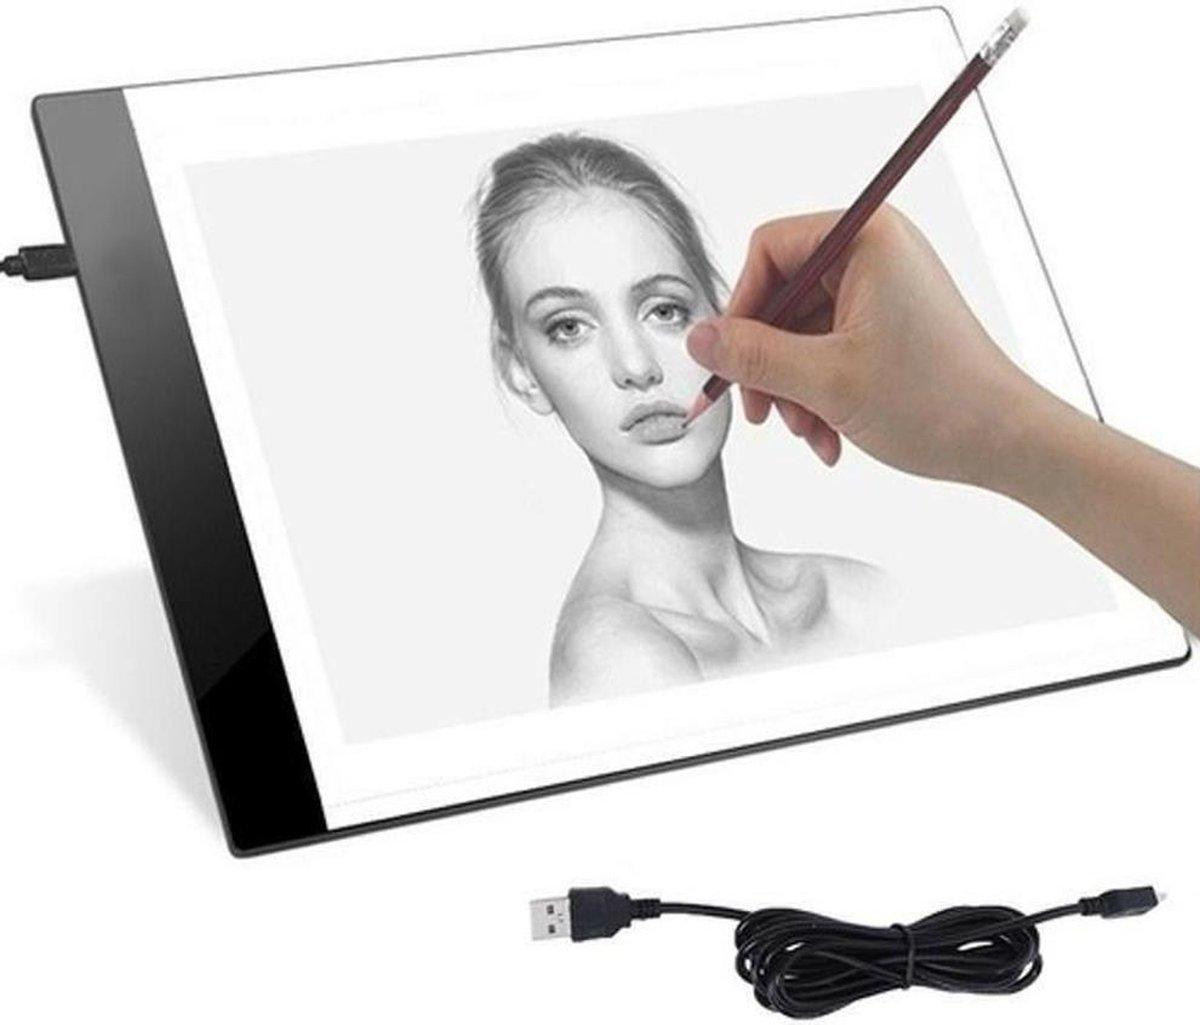 A&K A4 LED Lightpad - Ultra Dun - Diamond Painting - Lichtbak - Overtrekhulp - Lichttafel - Ledbord - Meetlint - Tekentafel - Overtekenen - Tekenborden - Overtrekken